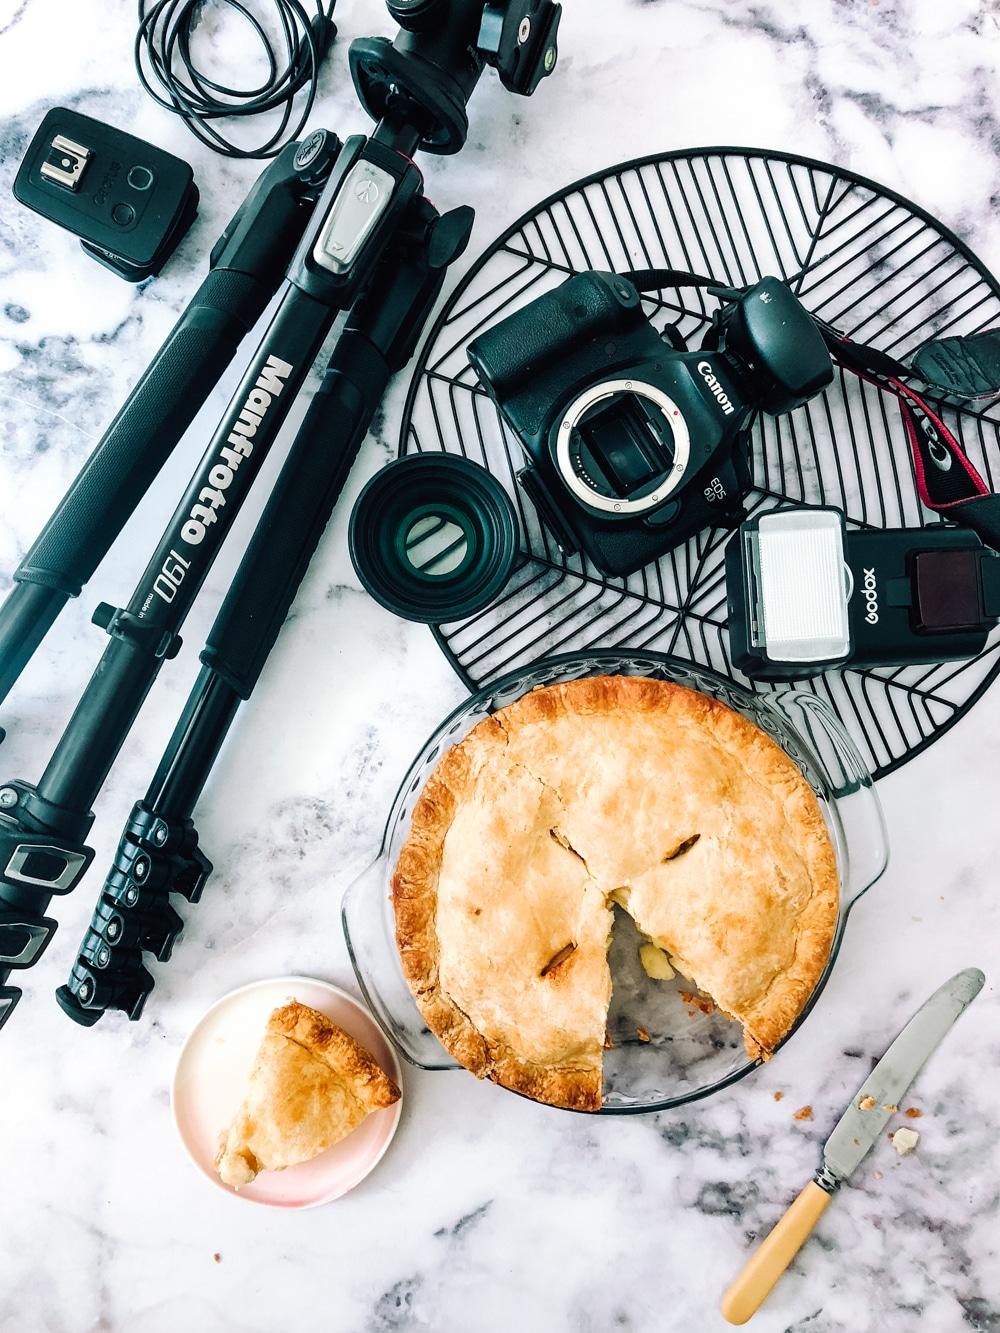 Food Photography Gear